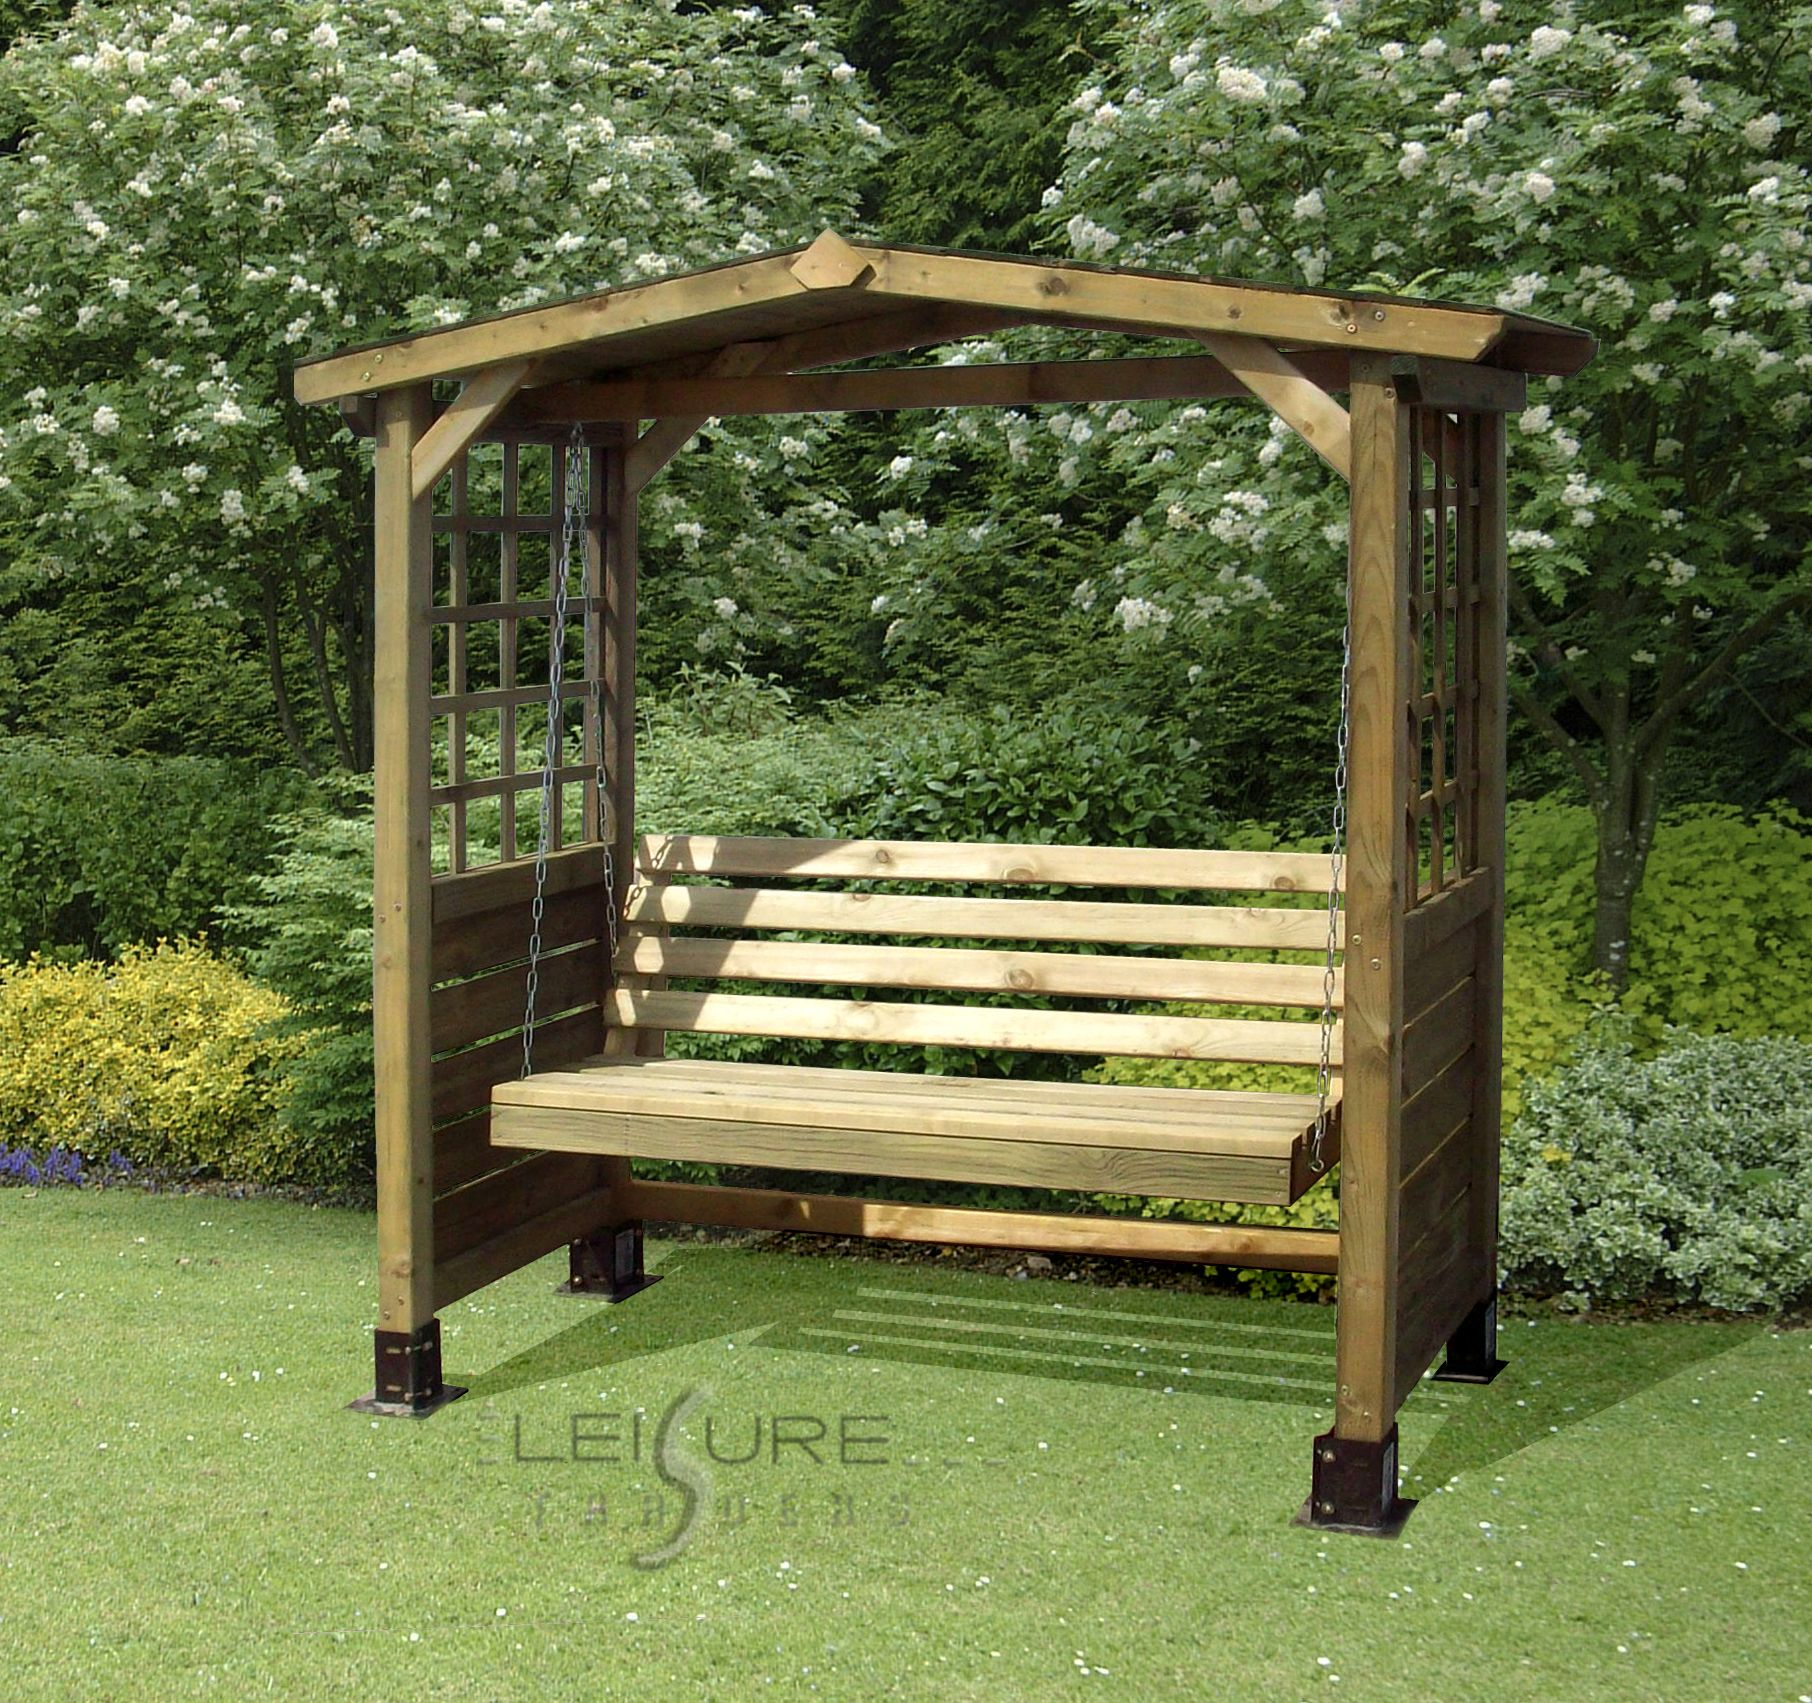 The poseidon arched arbour garden seat dream home pinterest